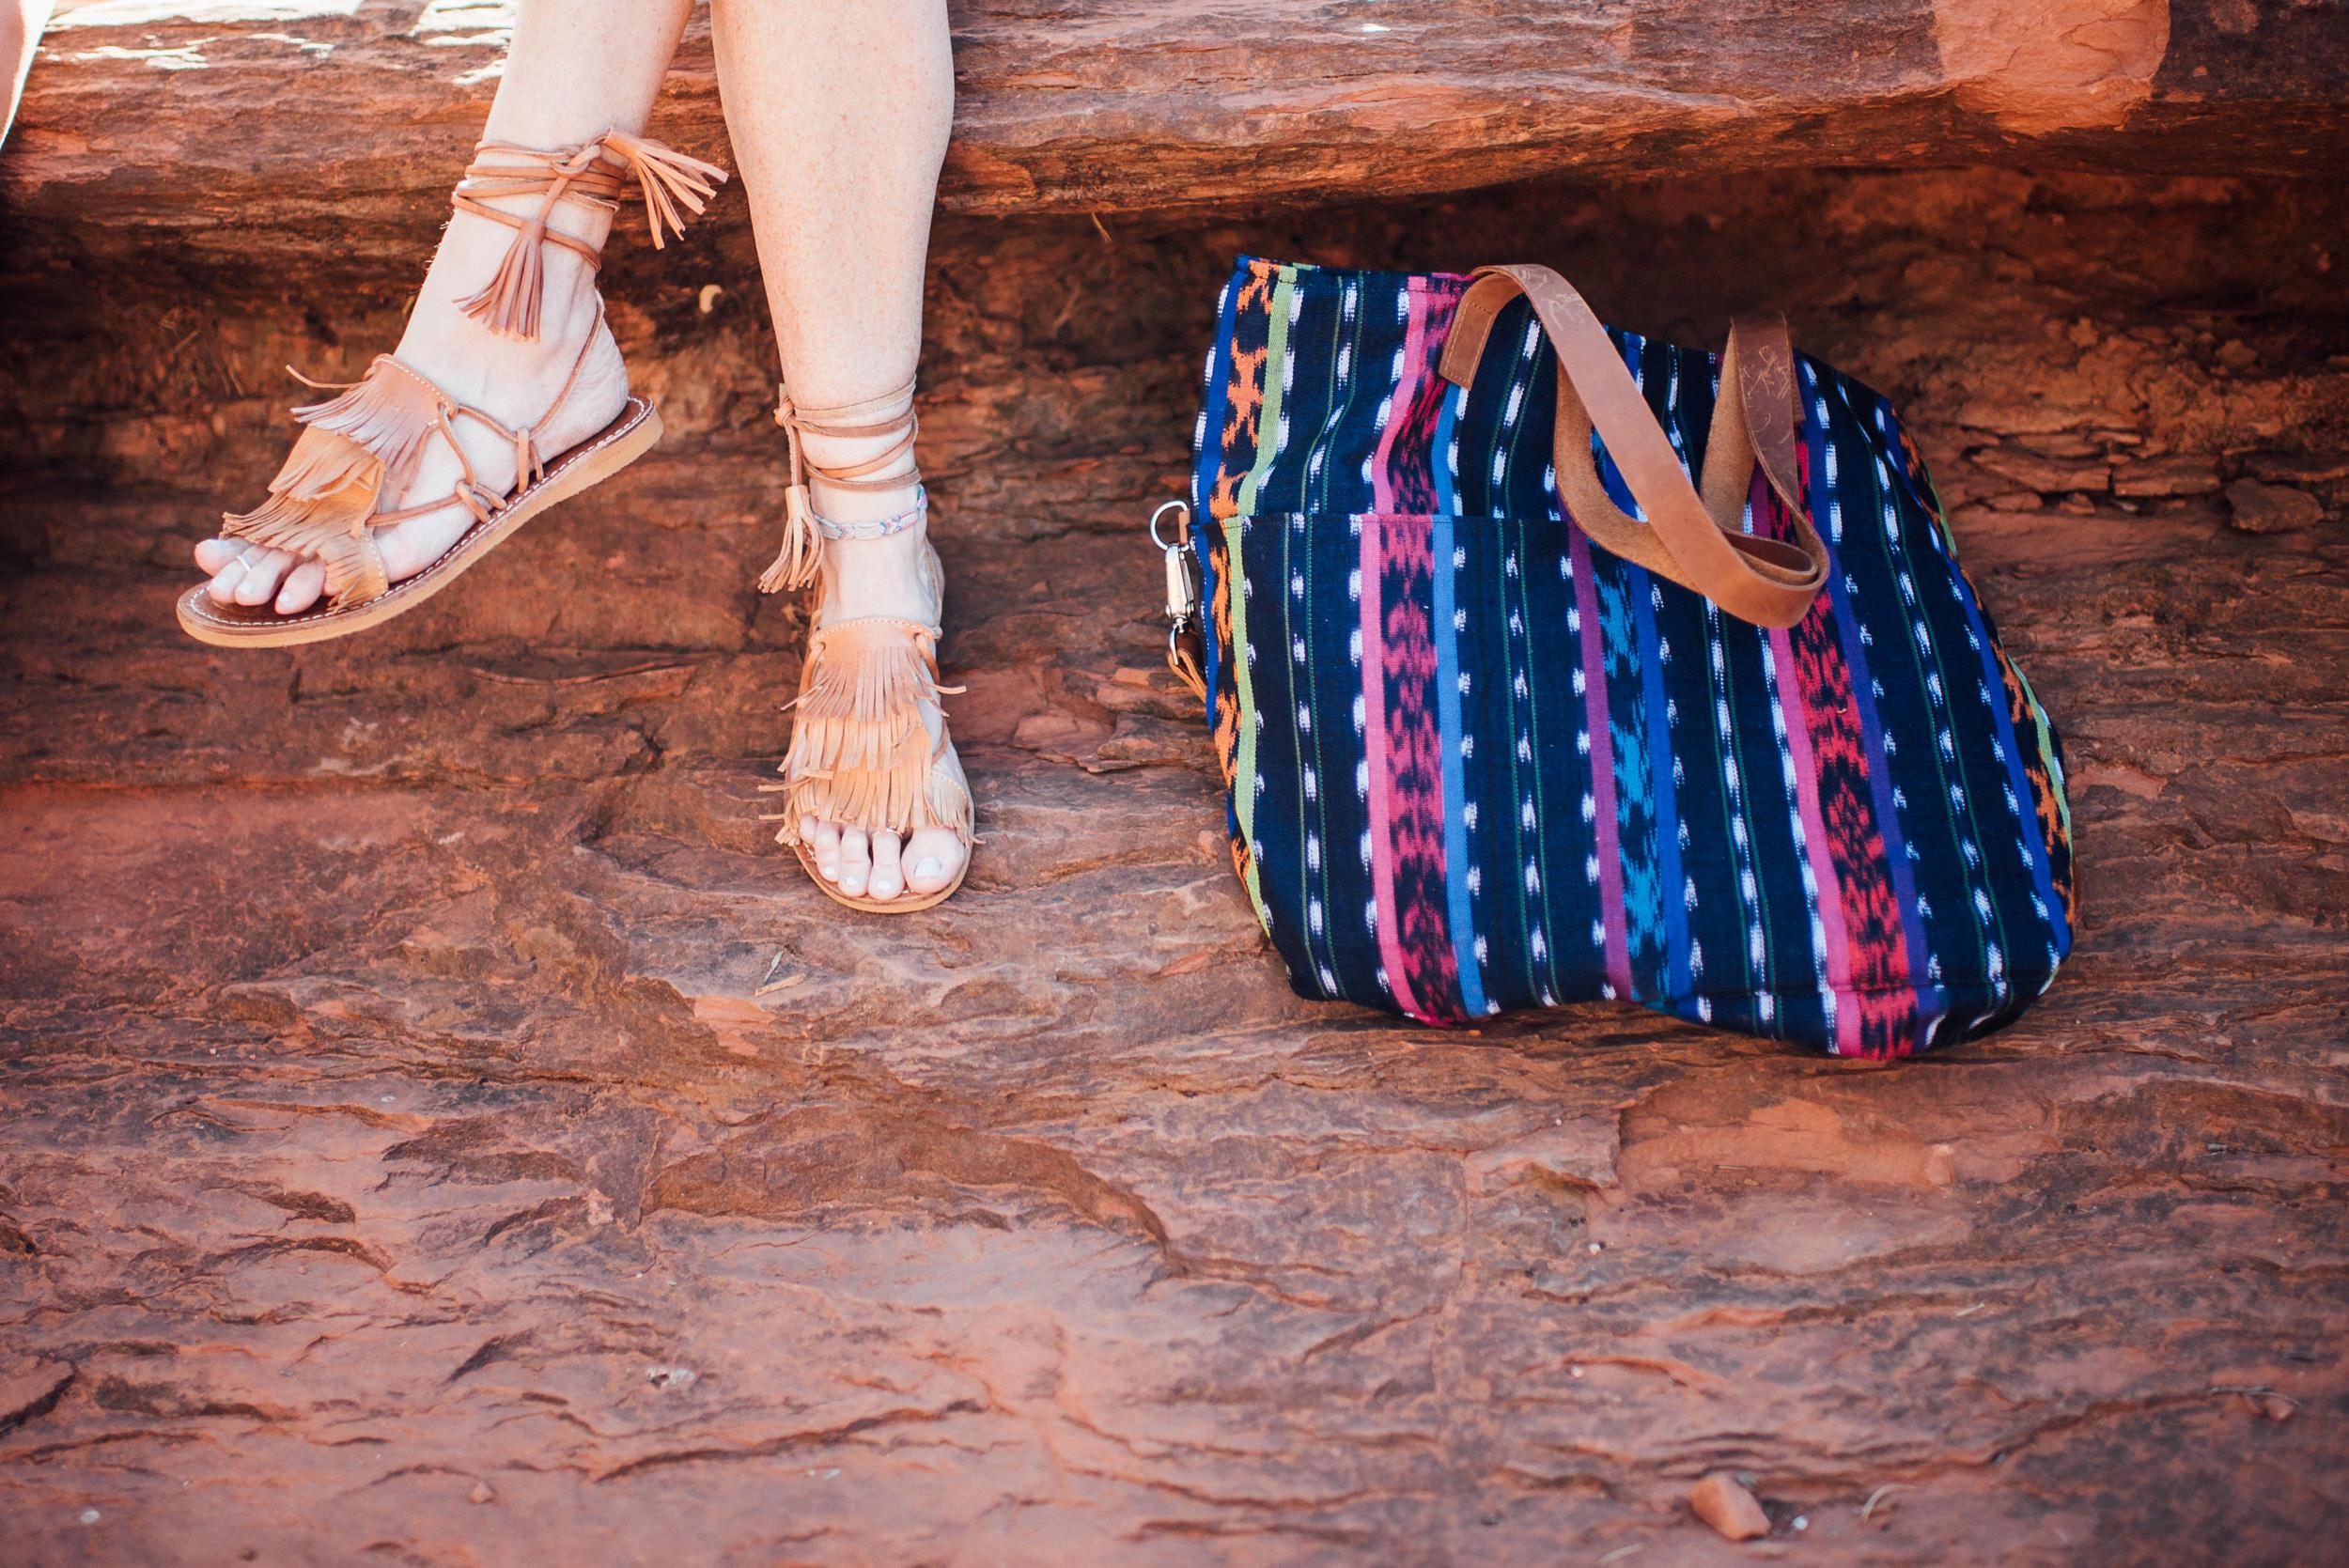 Arizona-Boho-Wedding-Photographer-Handbags-14.jpg